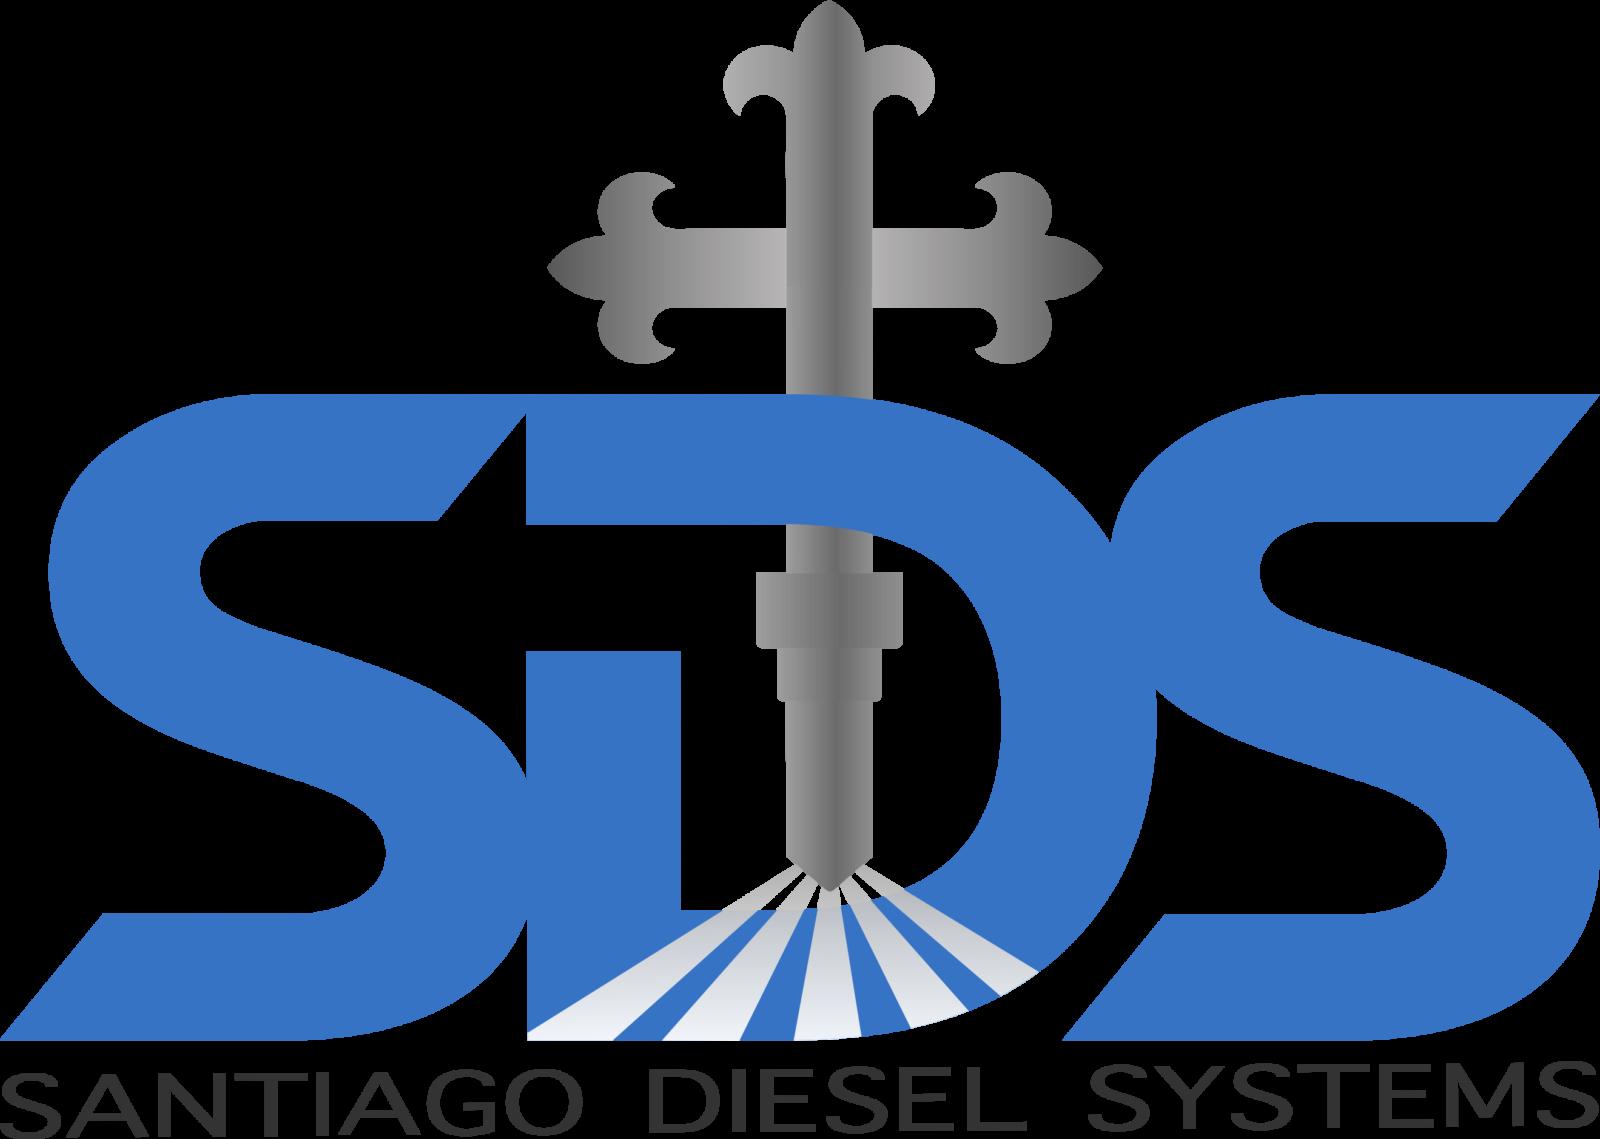 Santiago Diesel Systems